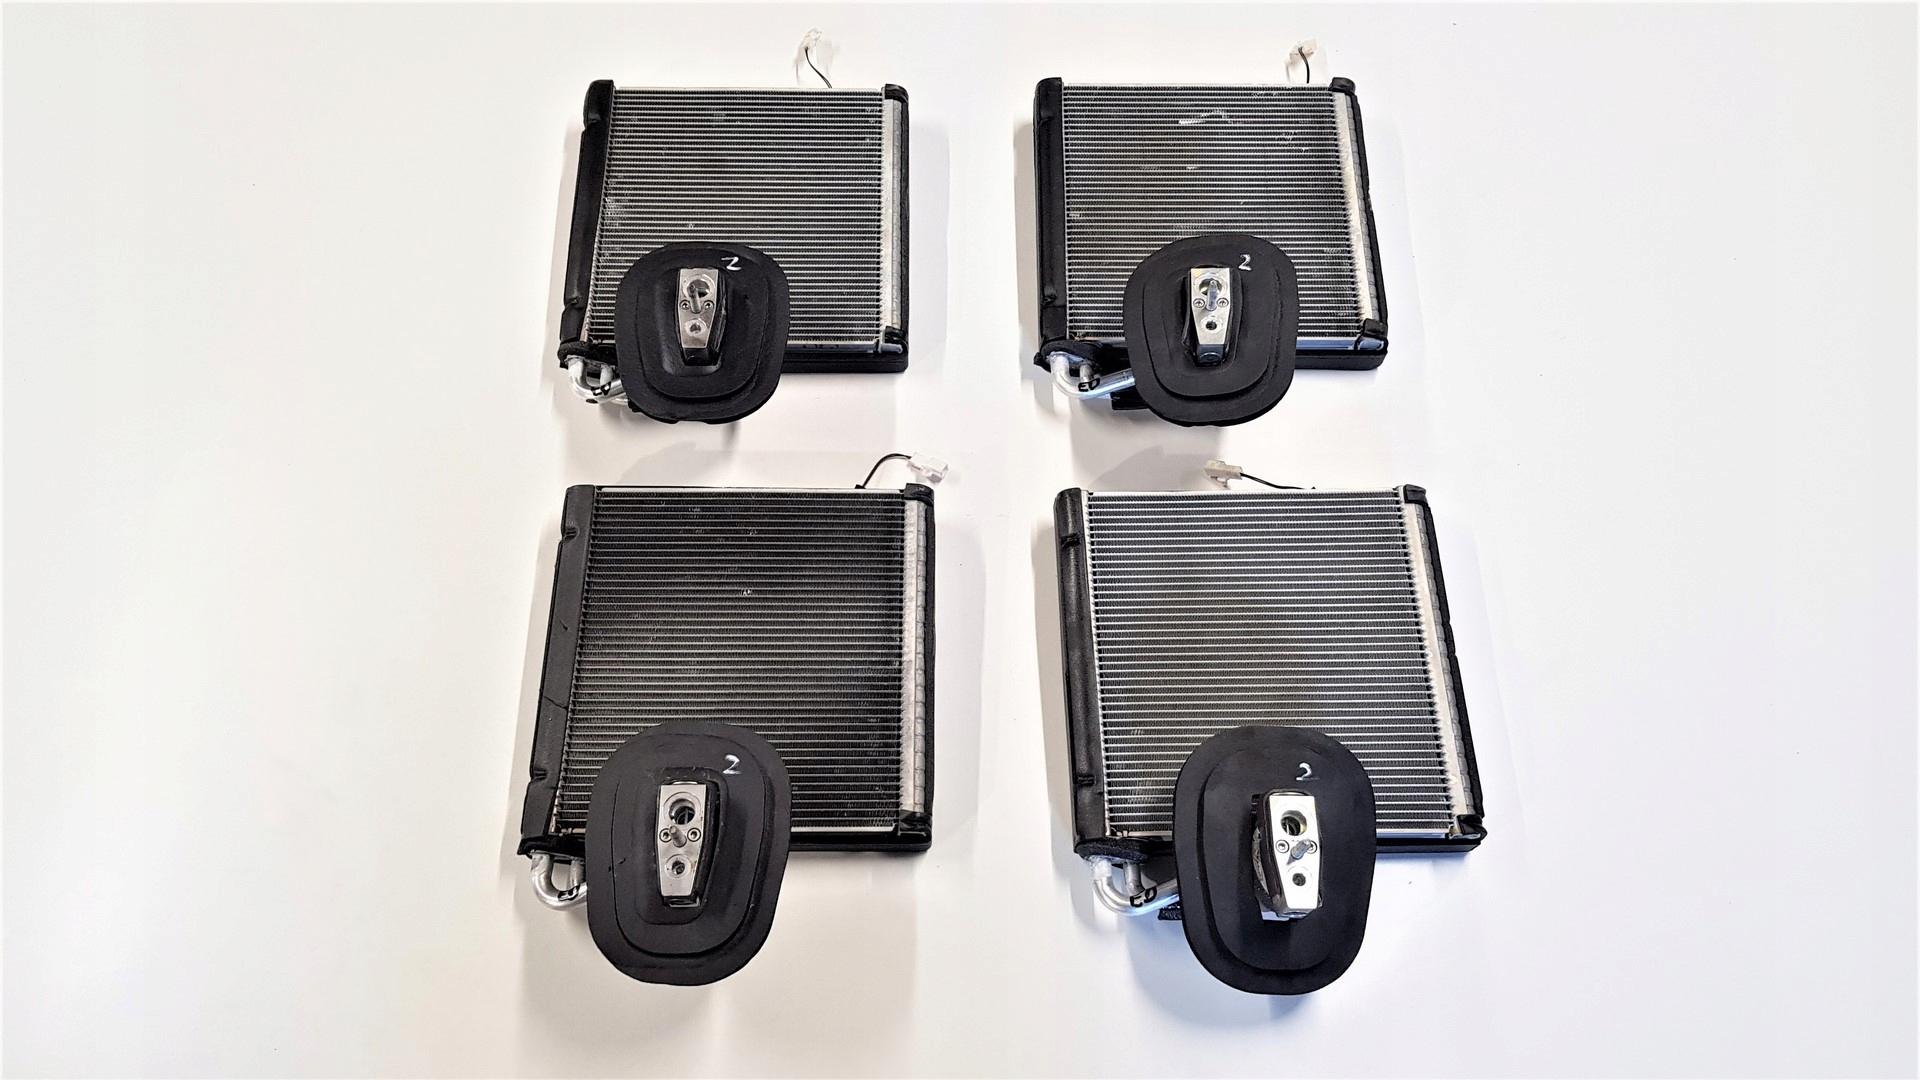 радиатор нагревателя edge s-max mk2 mondeo mk5